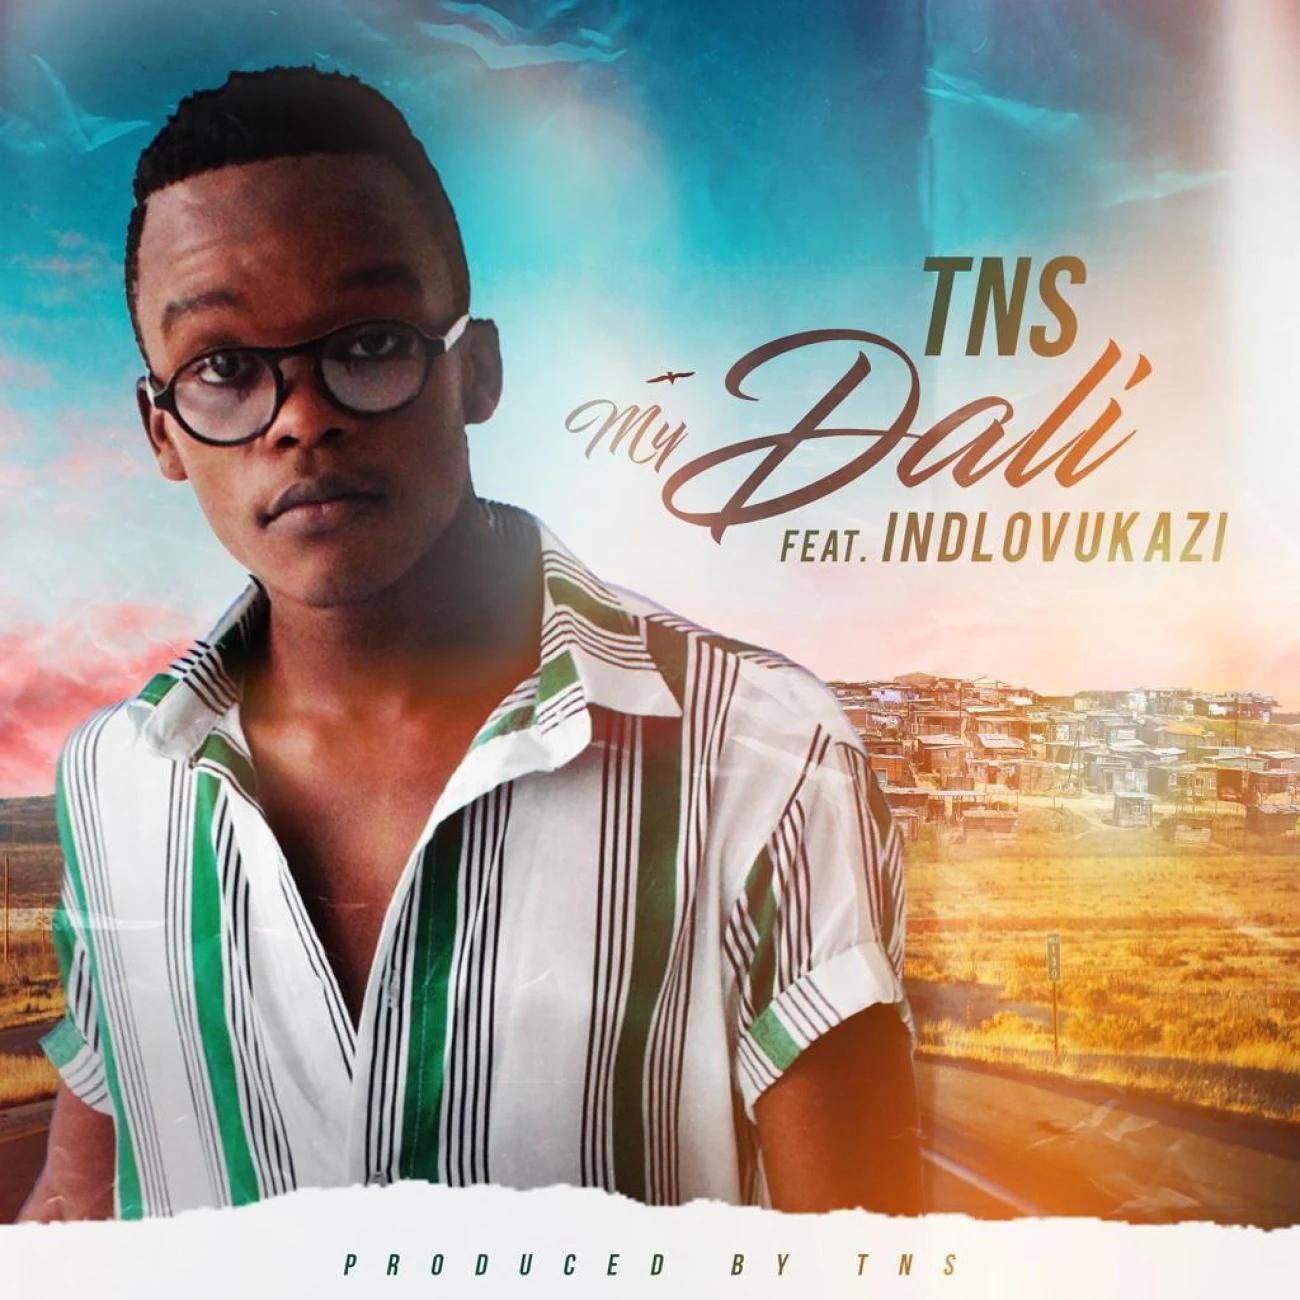 Tns My Dali Ft Indlovukazi Techno Bros House Villains Bootleg In 2020 Latest Music Videos African Music Music Download